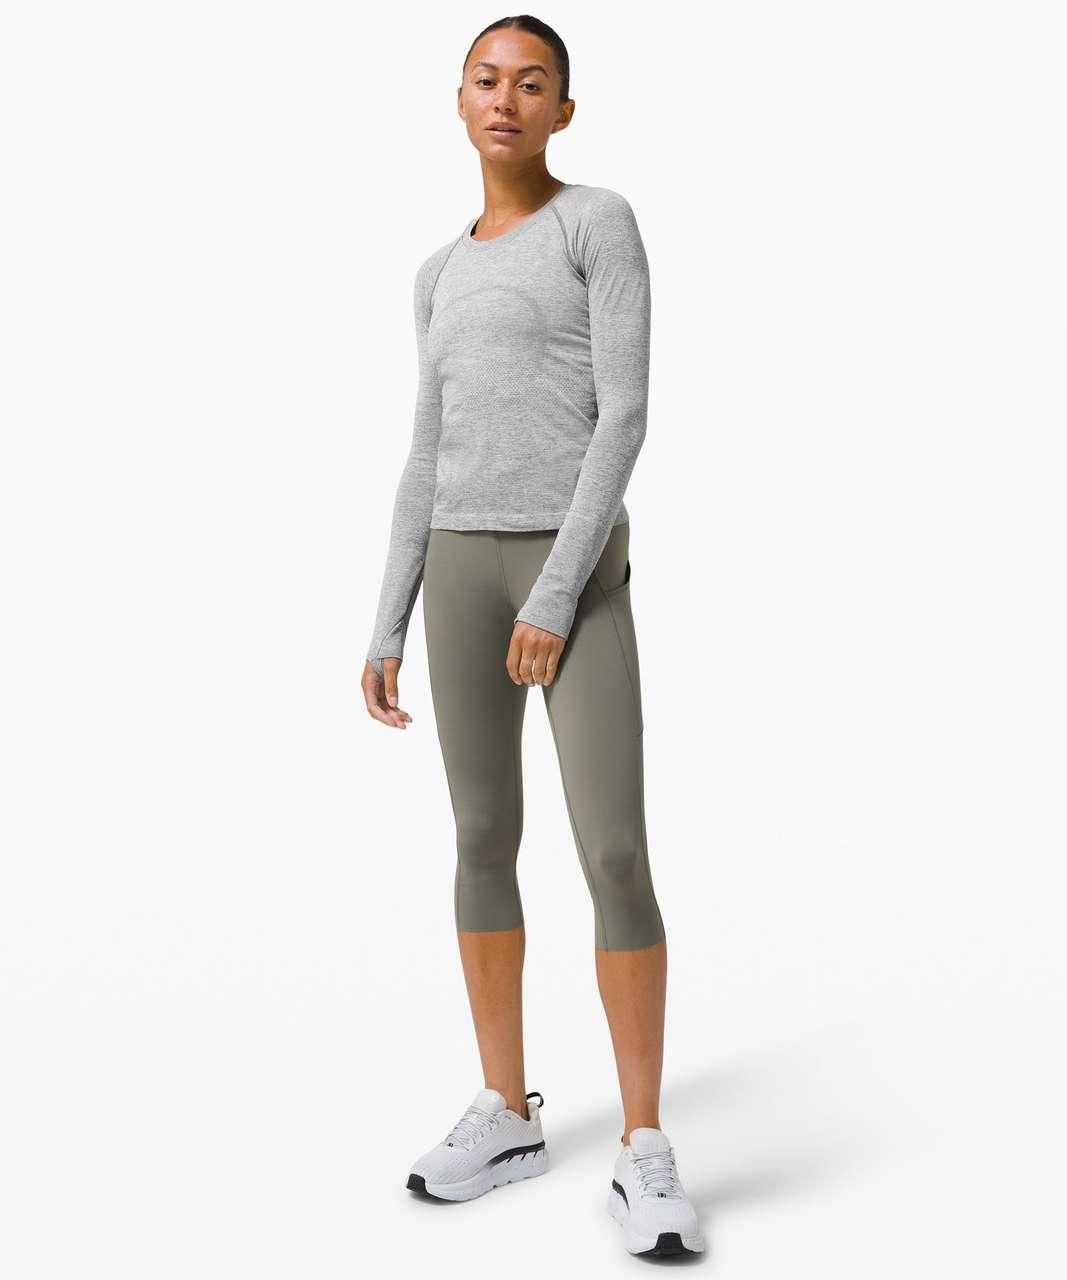 Lululemon Swiftly Tech Long Sleeve Shirt 2.0 *Race Length - Slate / White